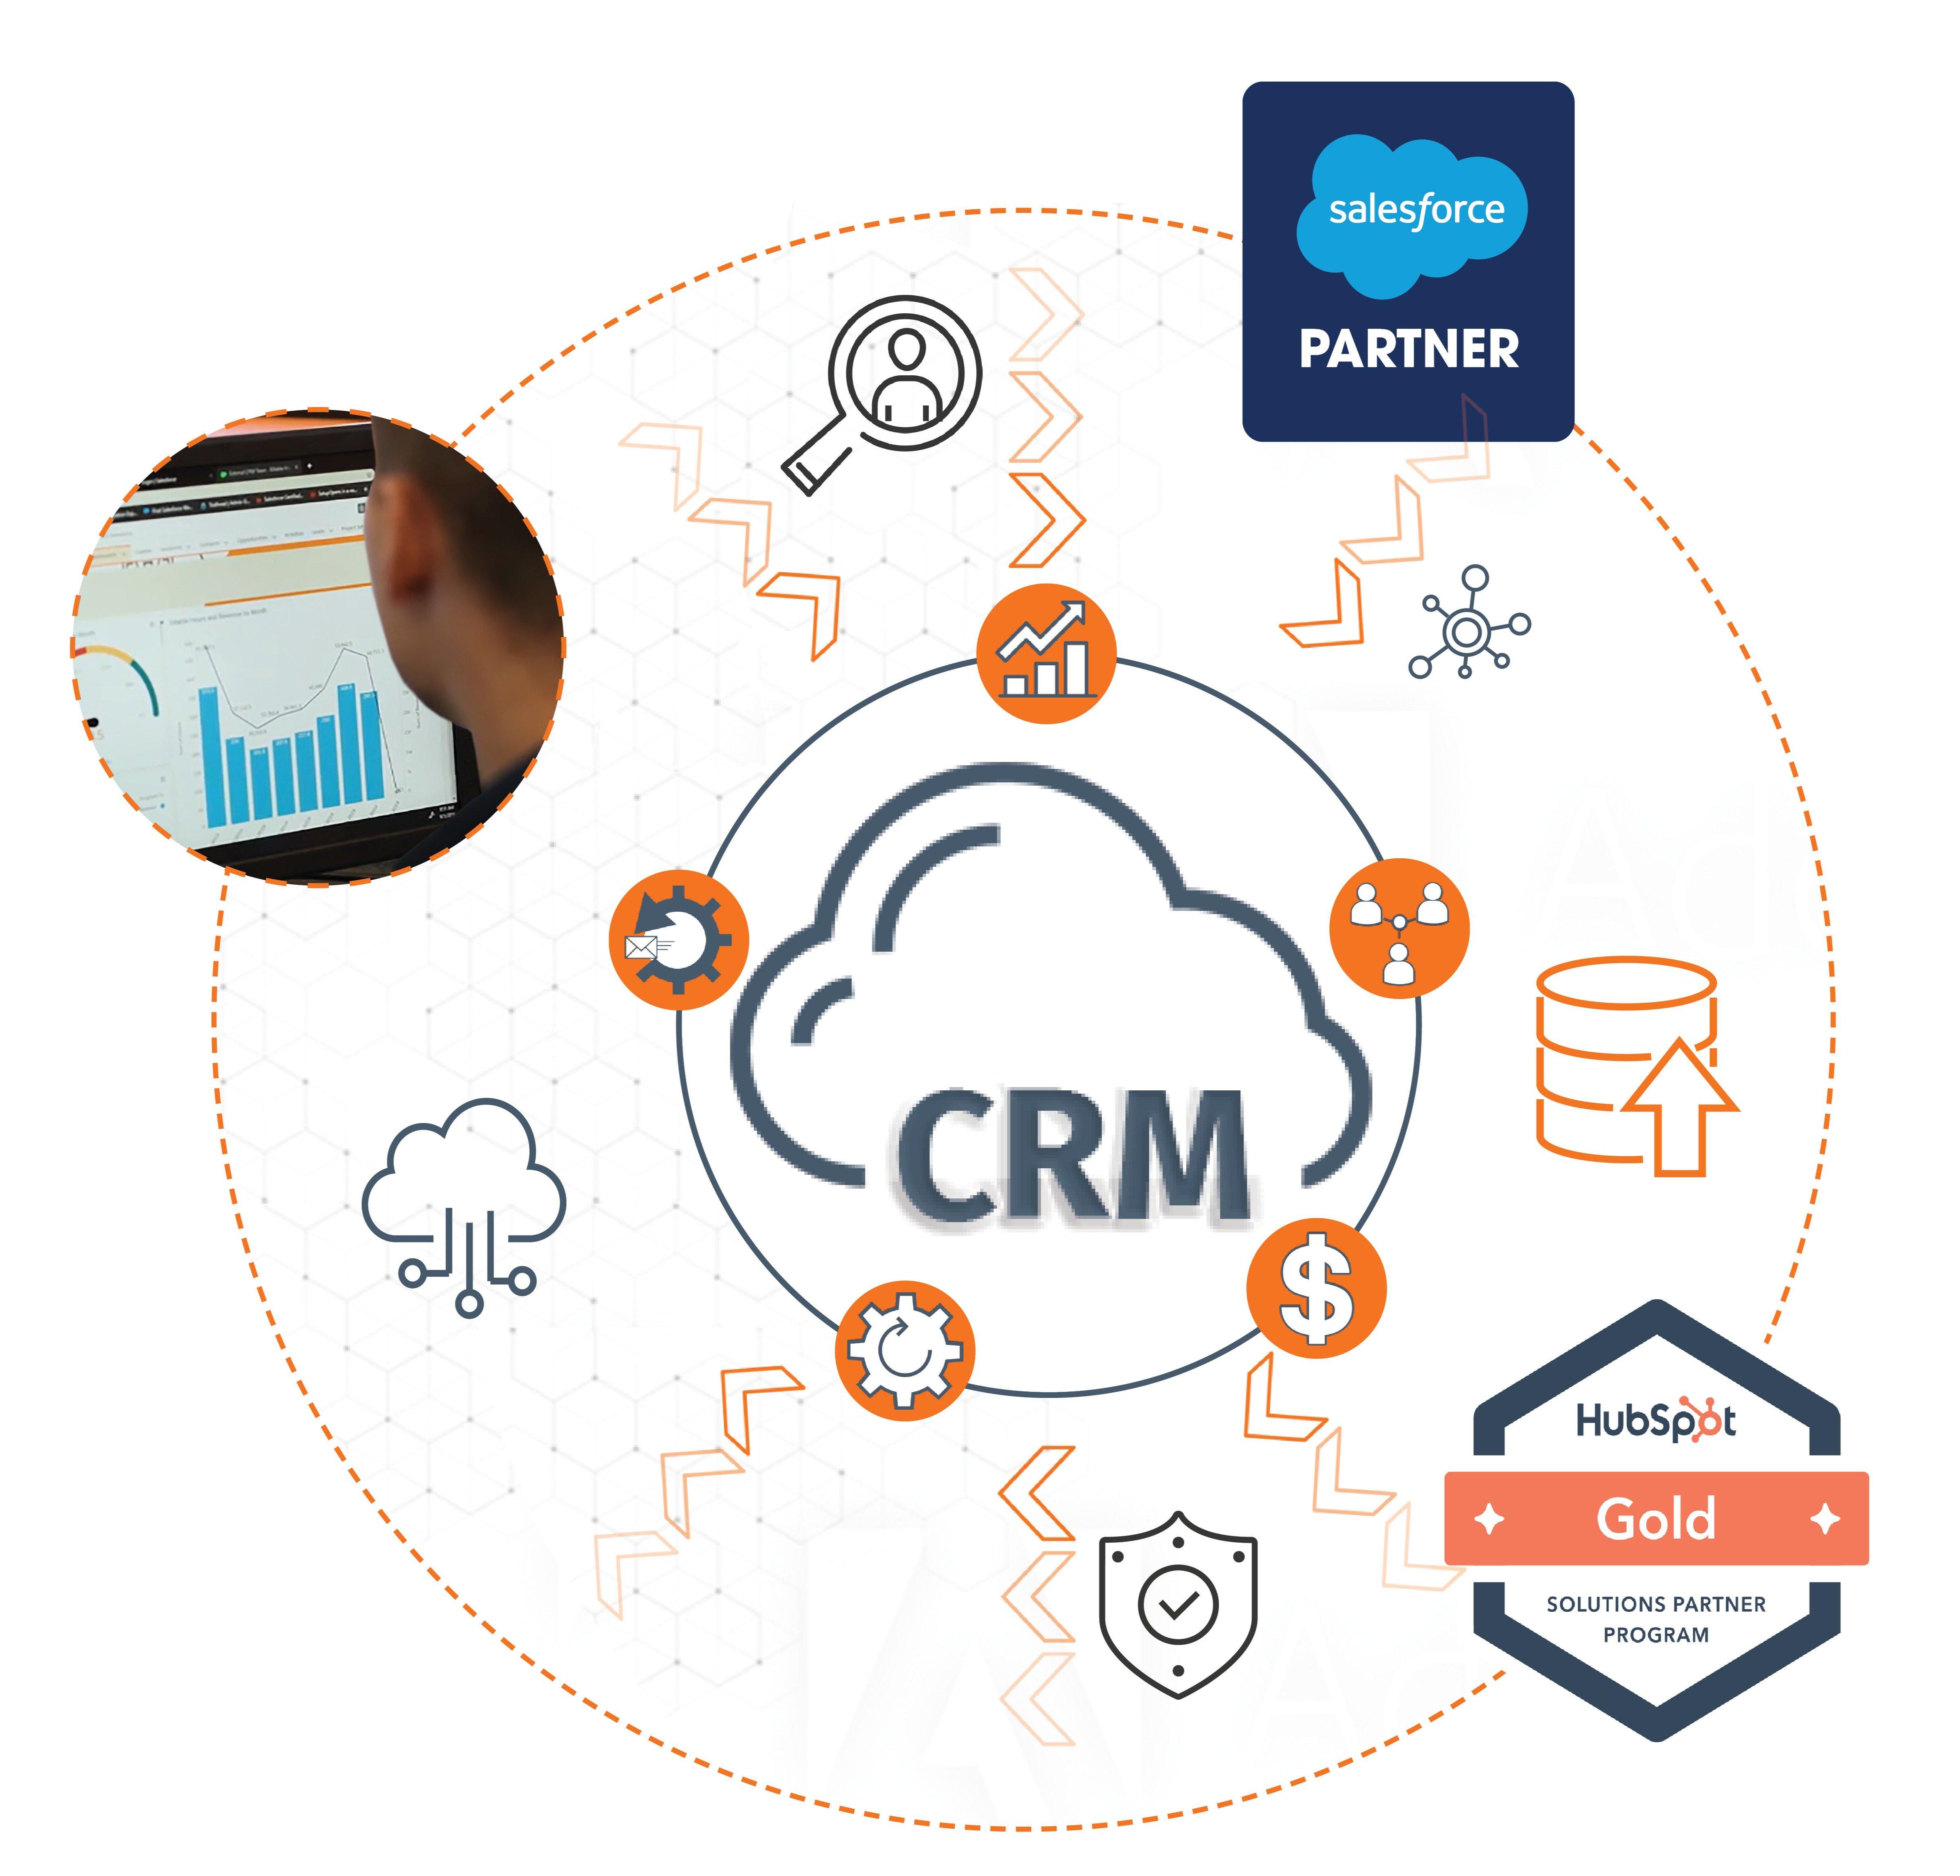 CRM graphic3